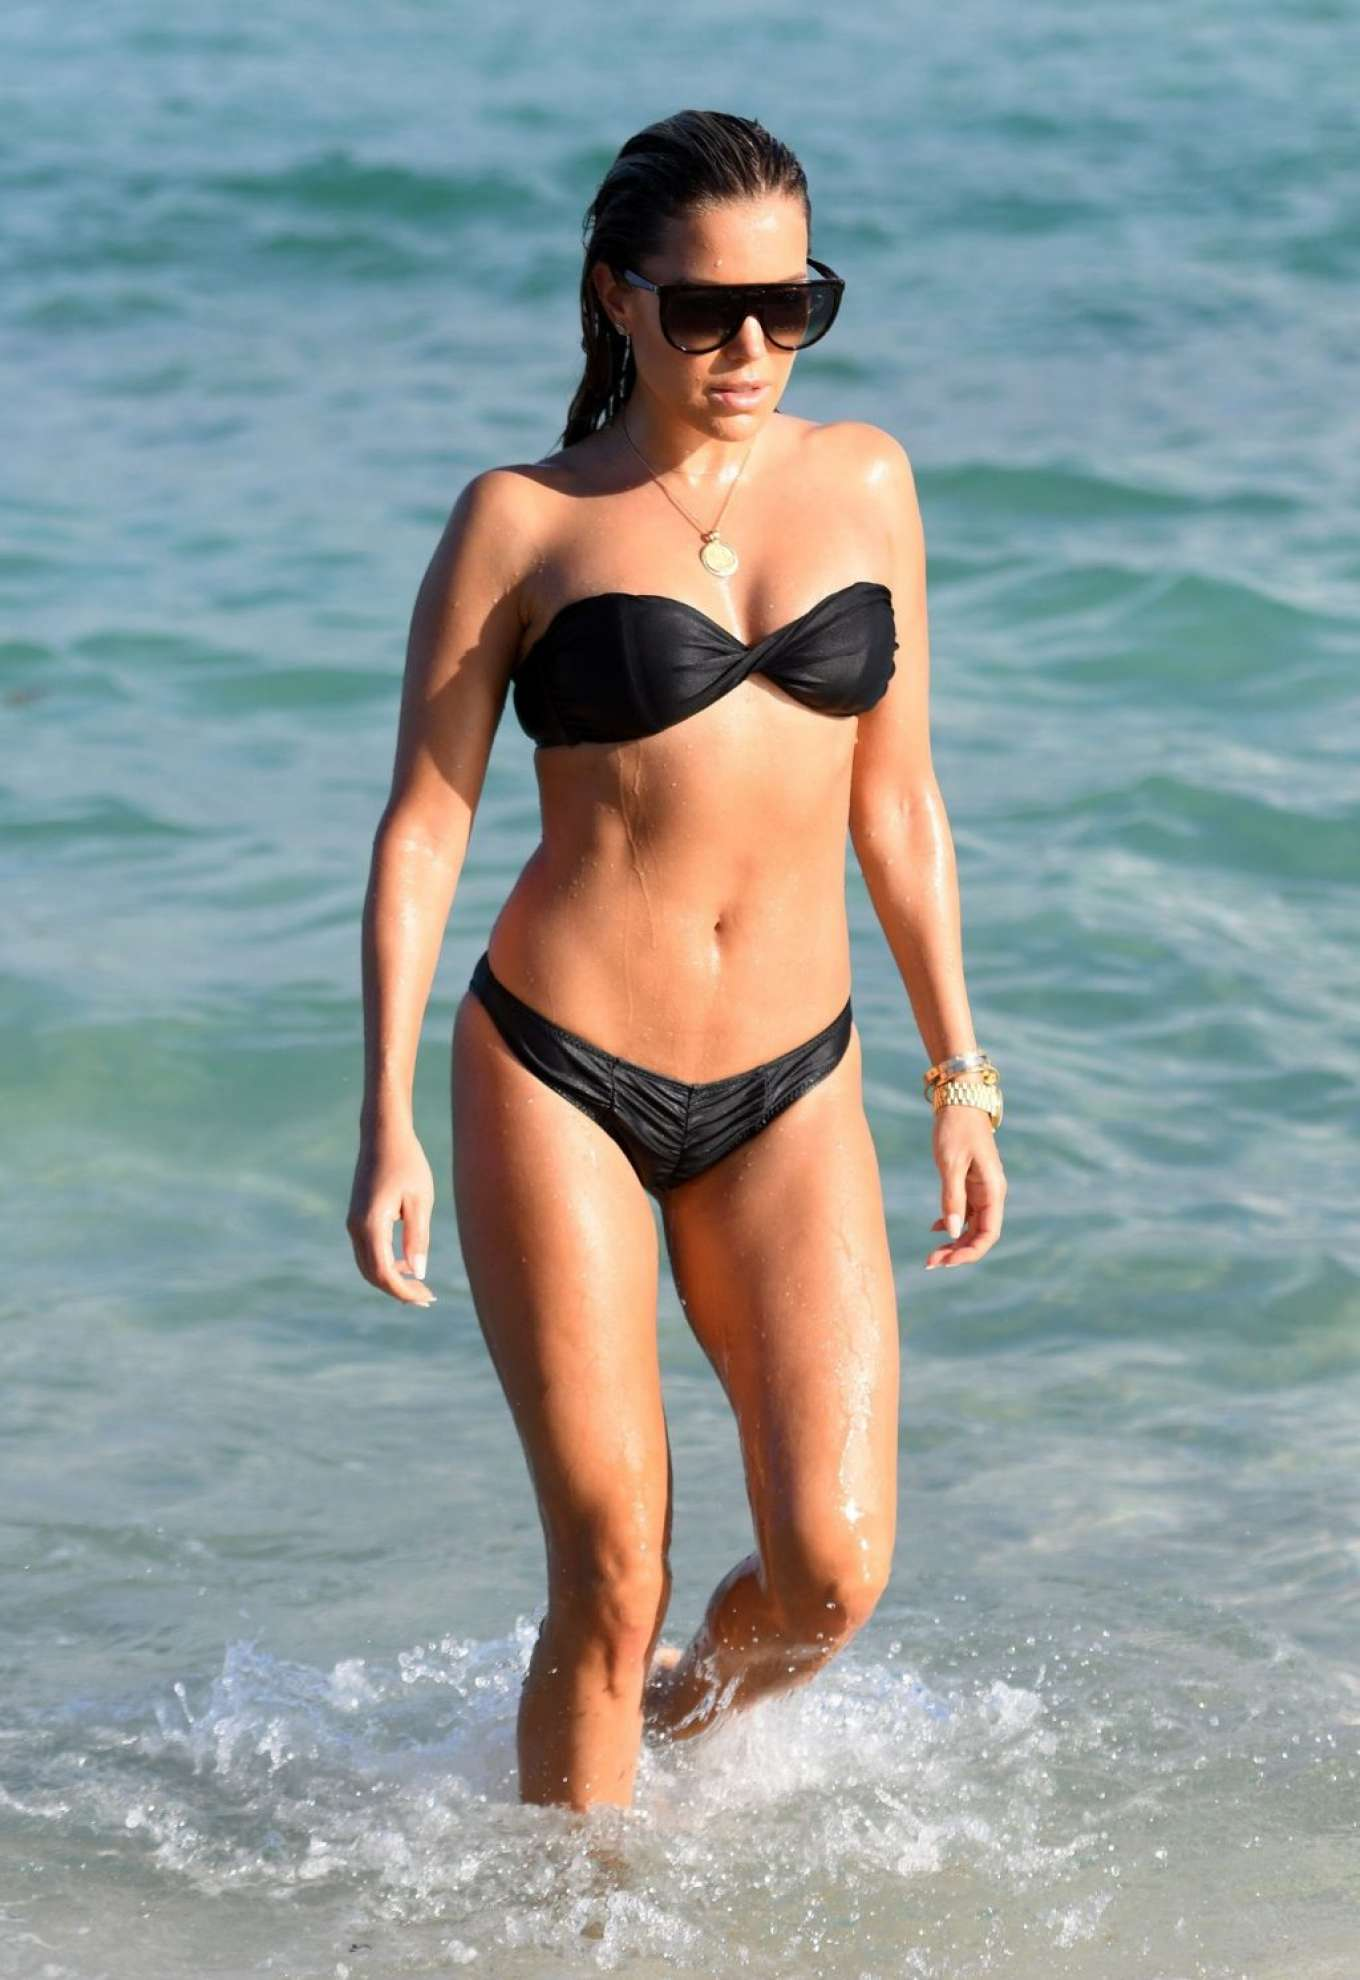 Sylvie Meis in Black Bikini on the beach in Miami